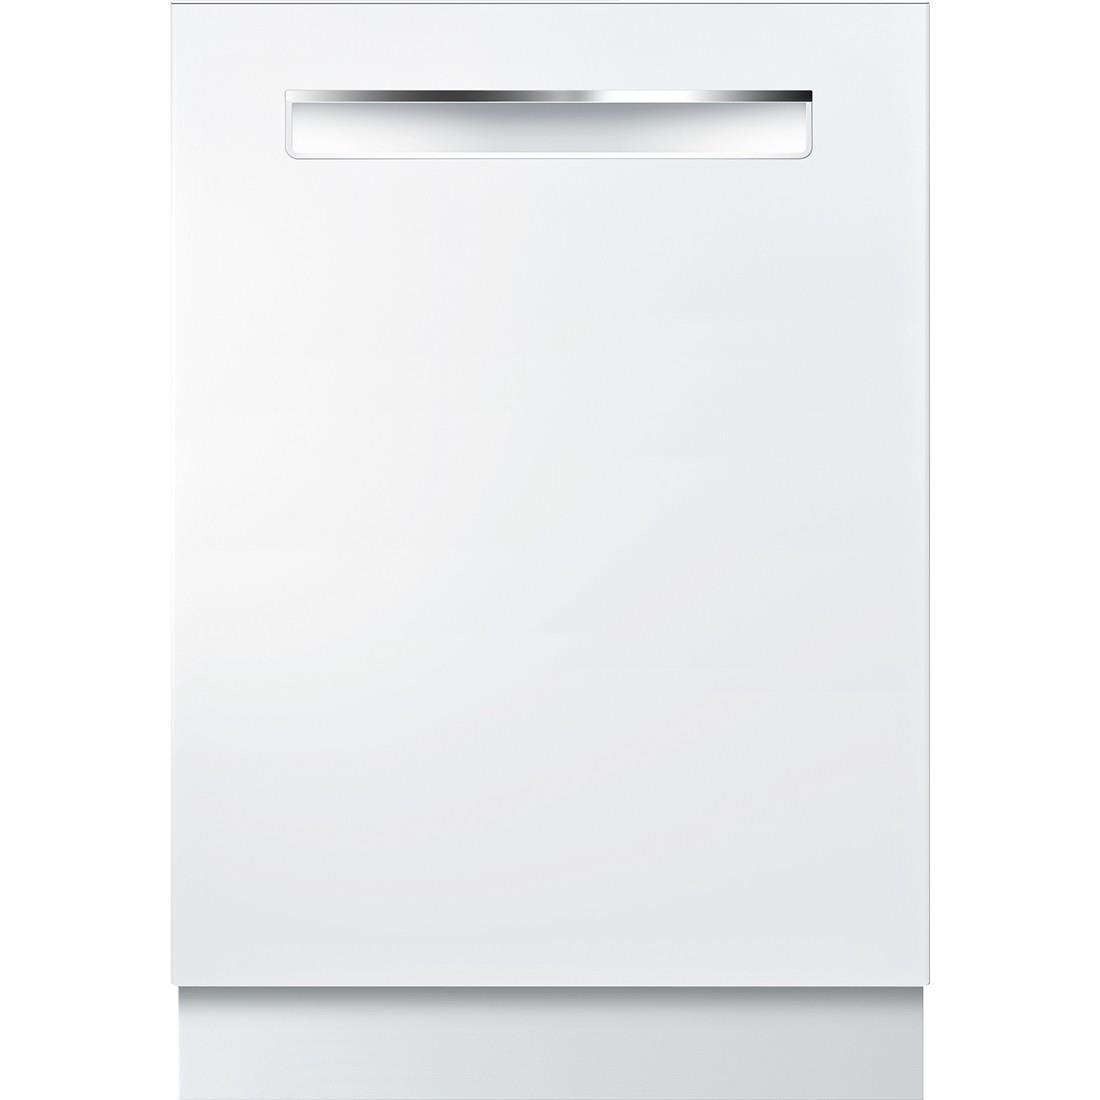 "Bosch Dishwashers 24"" Built-In Dishwasher - Item Number: SHP65T52UC"